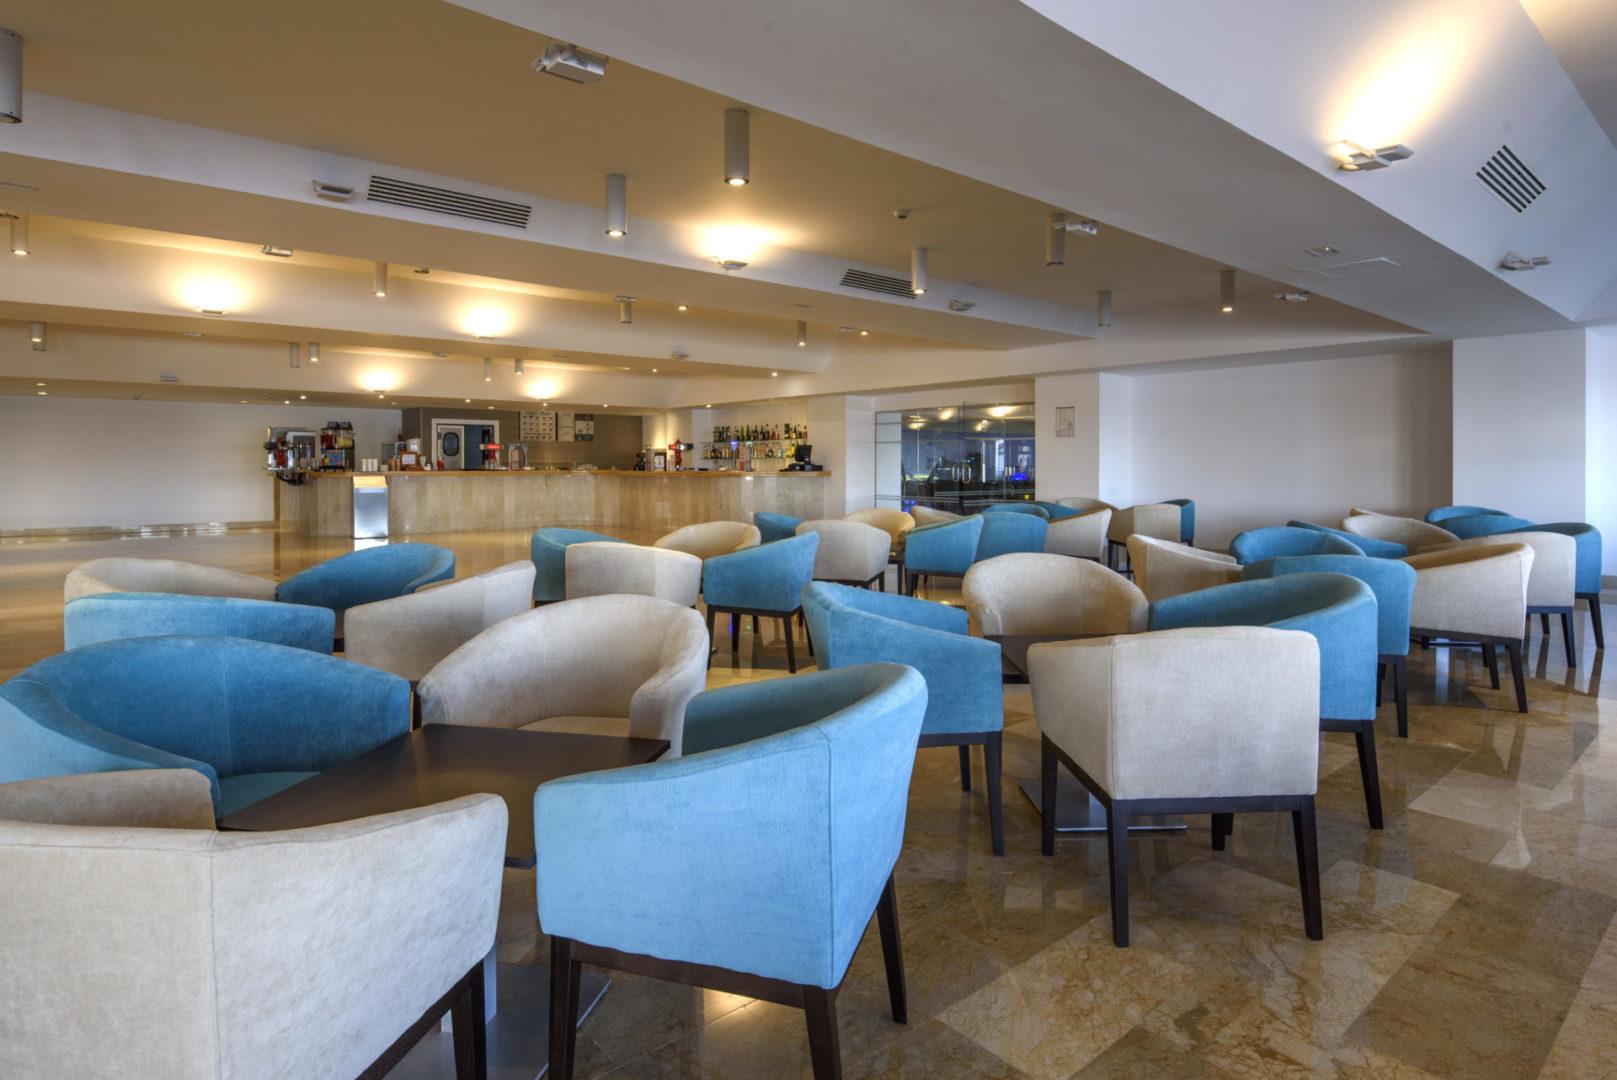 Hotel Doblemar 2-228-La Manga Urdecon